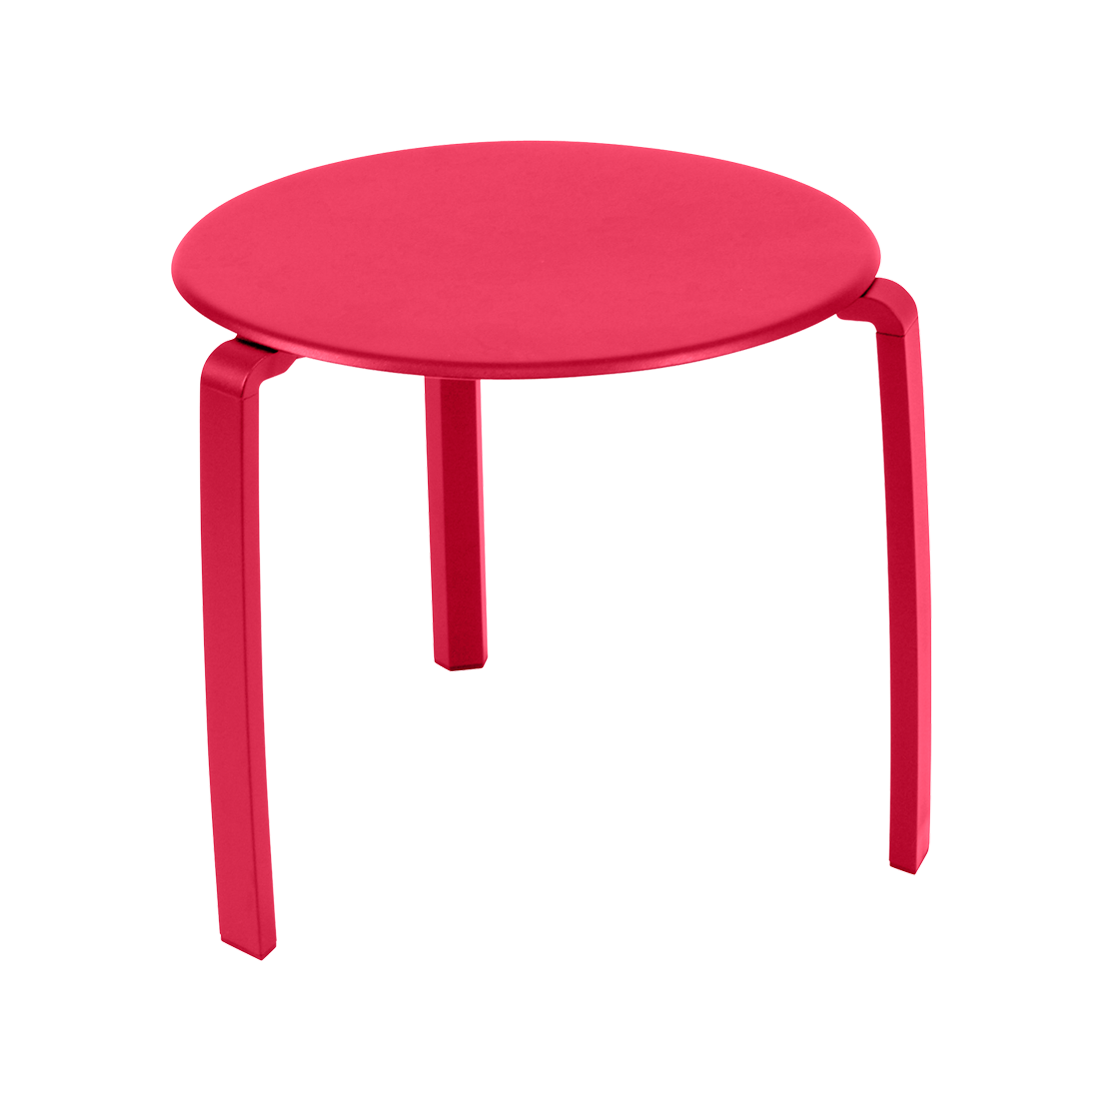 petite table basse metal, petite table basse, petite table basse rose